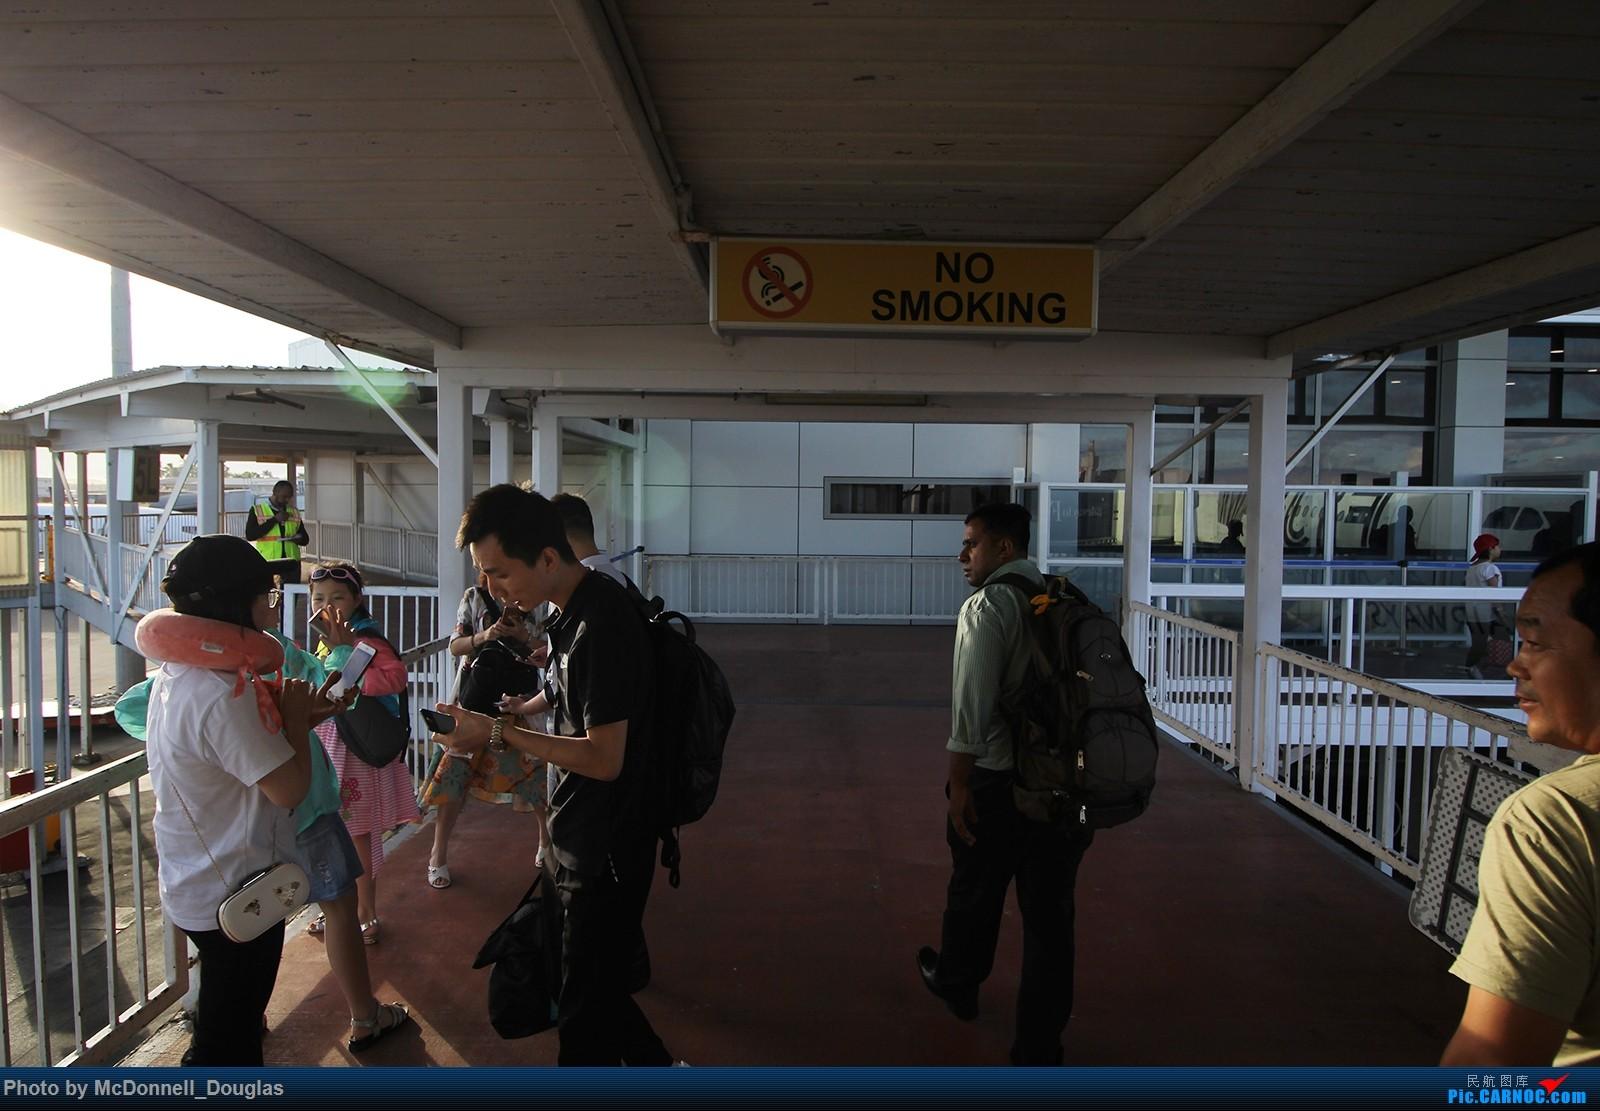 Re:[原创]【上海飞友会】【zc带你游天下(5)】起意只因一时冲动,飞过赤道去避暑,领略南太平洋别样的风光    斐济南迪机场